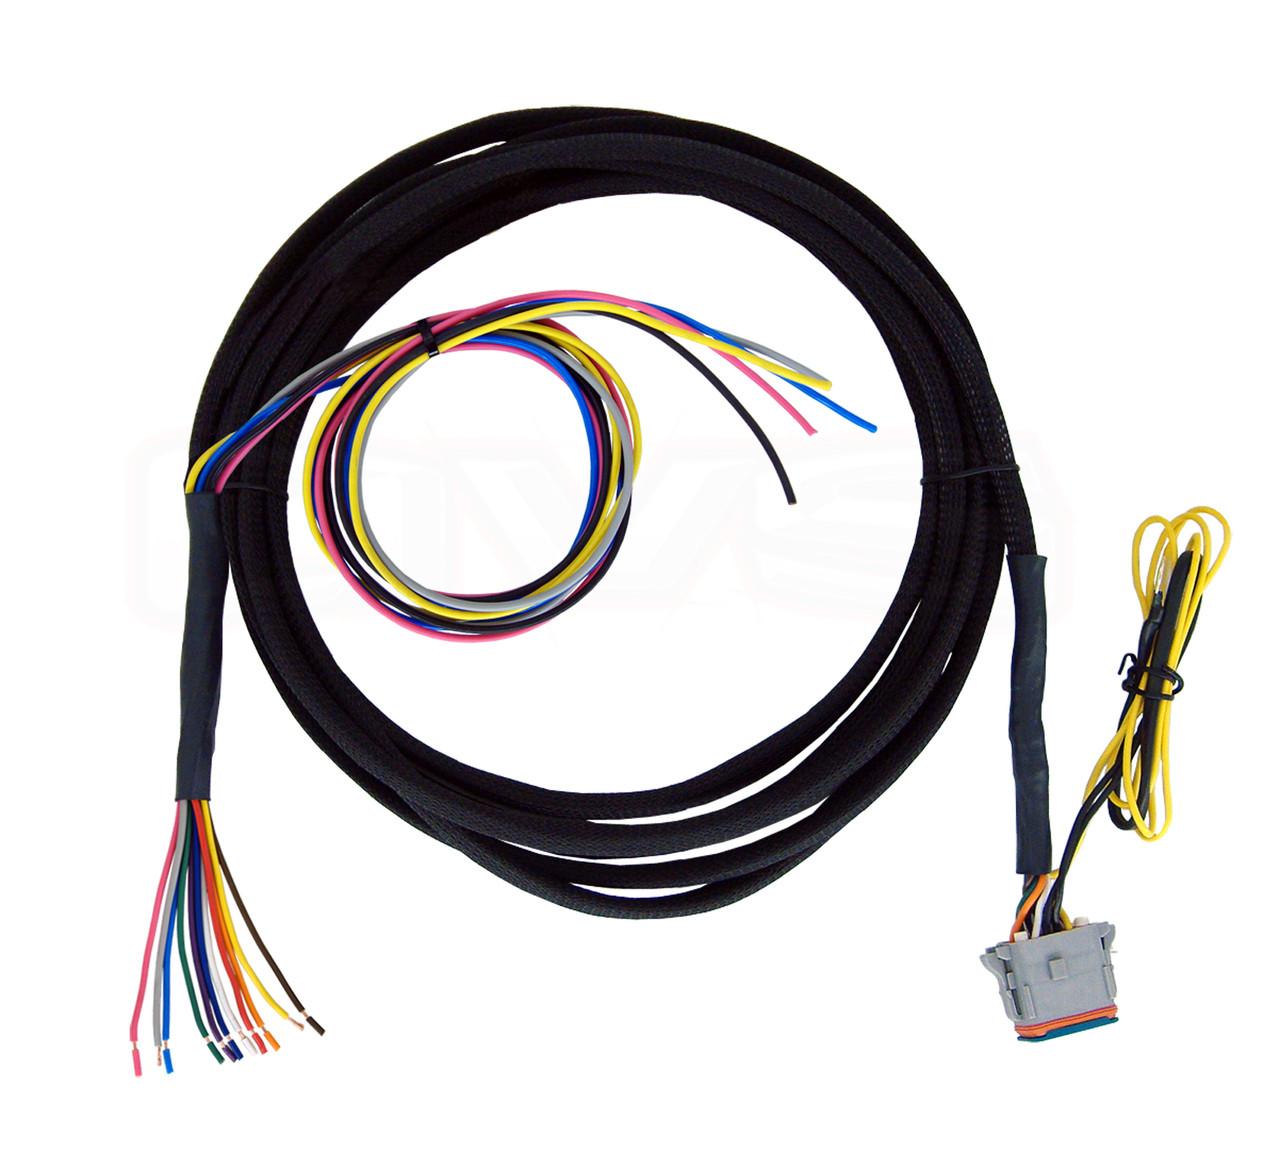 Accuair Wiring Diagram Explained Diagrams Dakota Digital Avs Valve Harness 10 15 20 Vu4 To